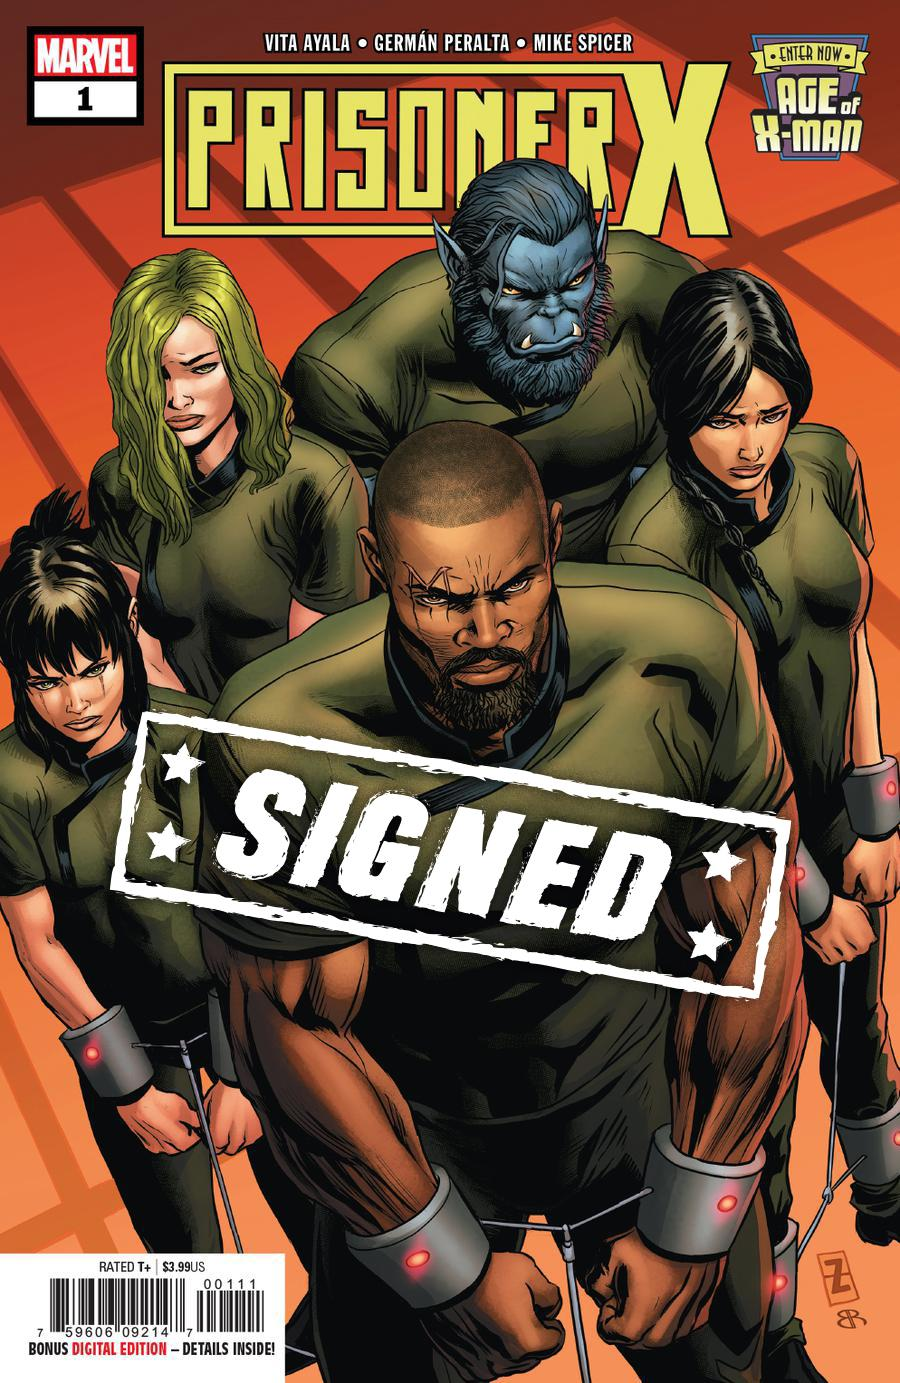 Age Of X-Man Prisoner X #1 Cover E Regular Patrick Zircher Cover Signed By Vita Ayala